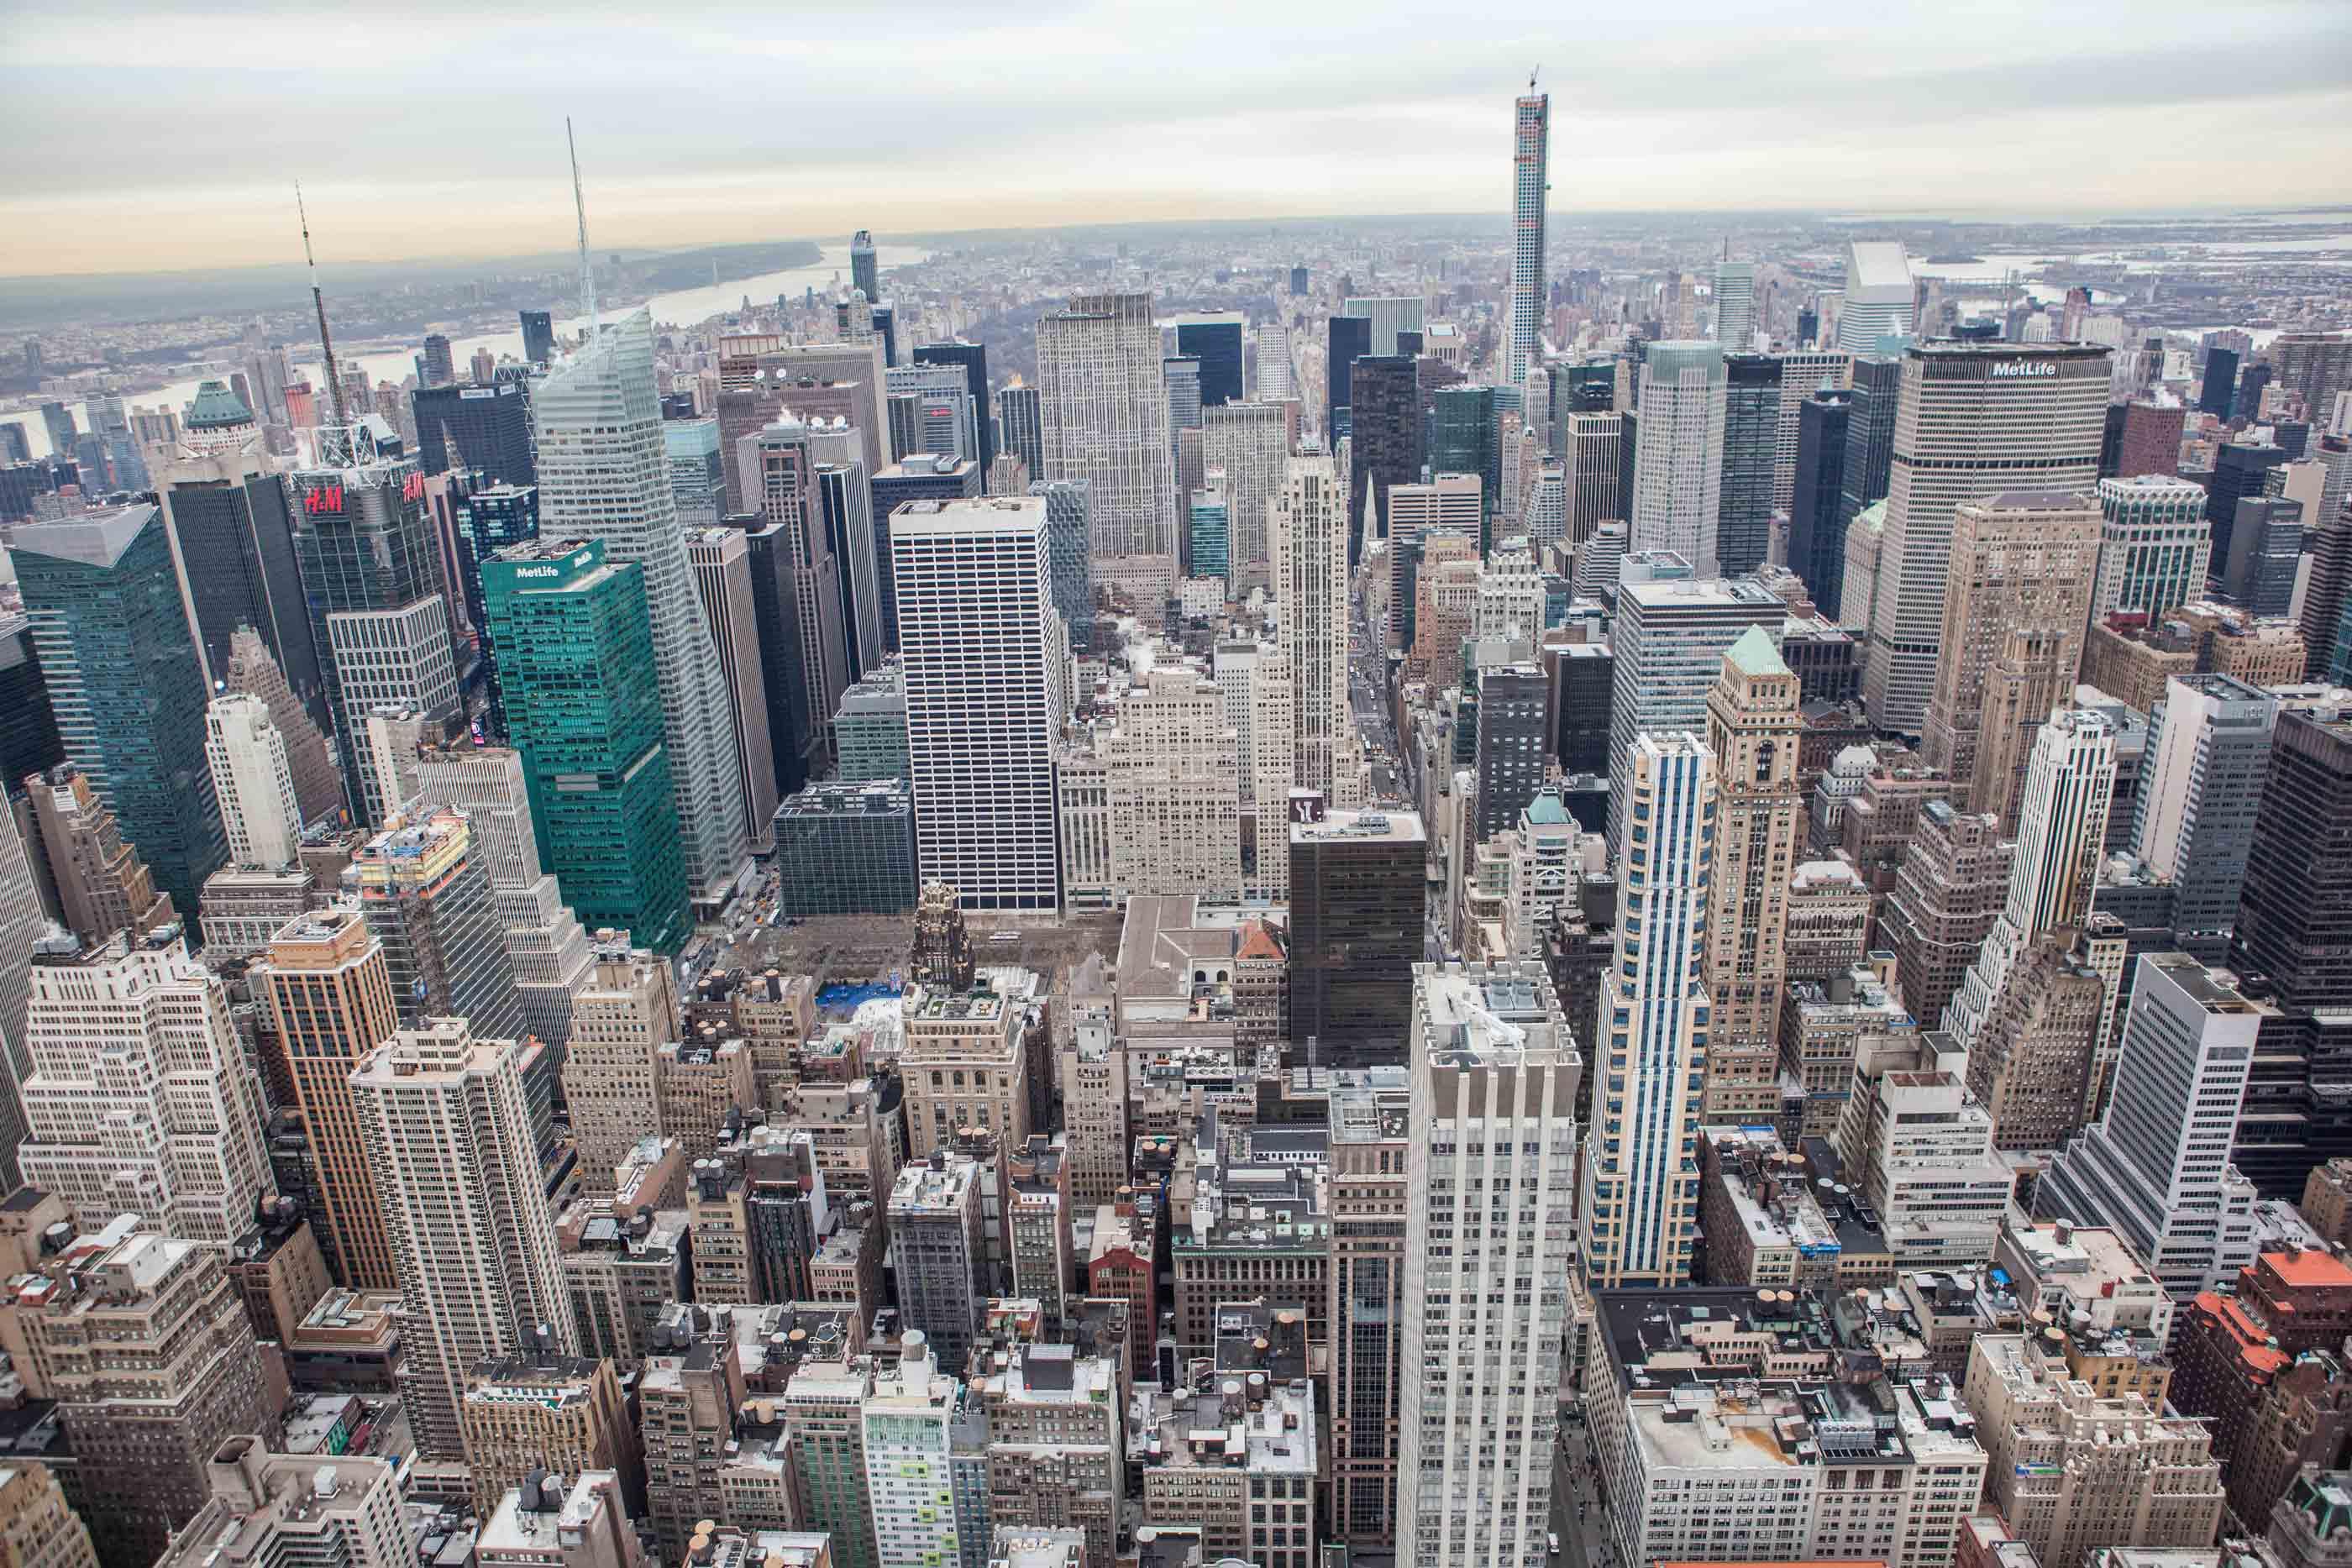 An Urbanisation Update: World Cities Day 2020